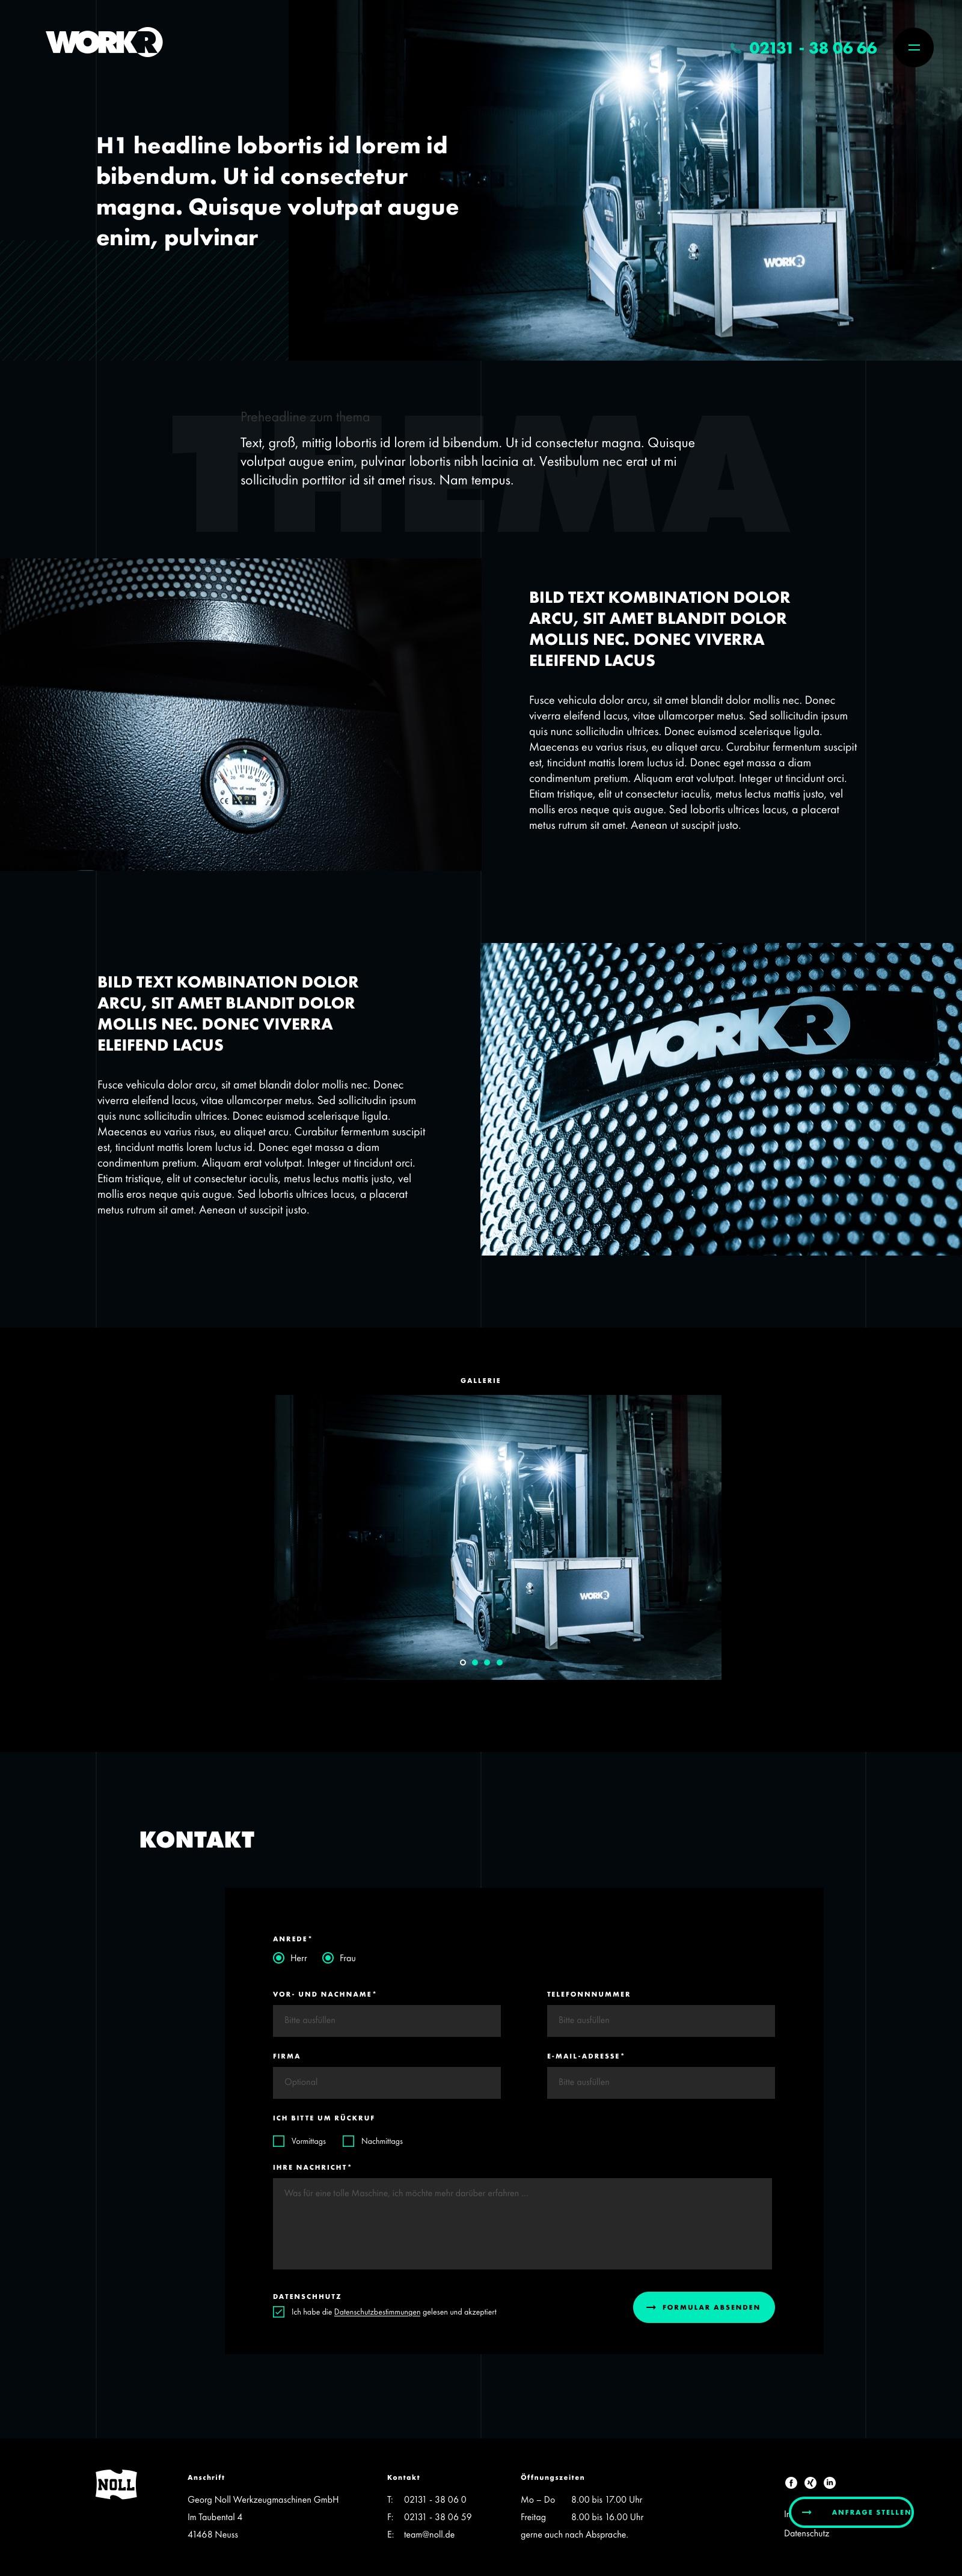 Workr Homepage Webdesign & Digital Branding - SEO-Seite